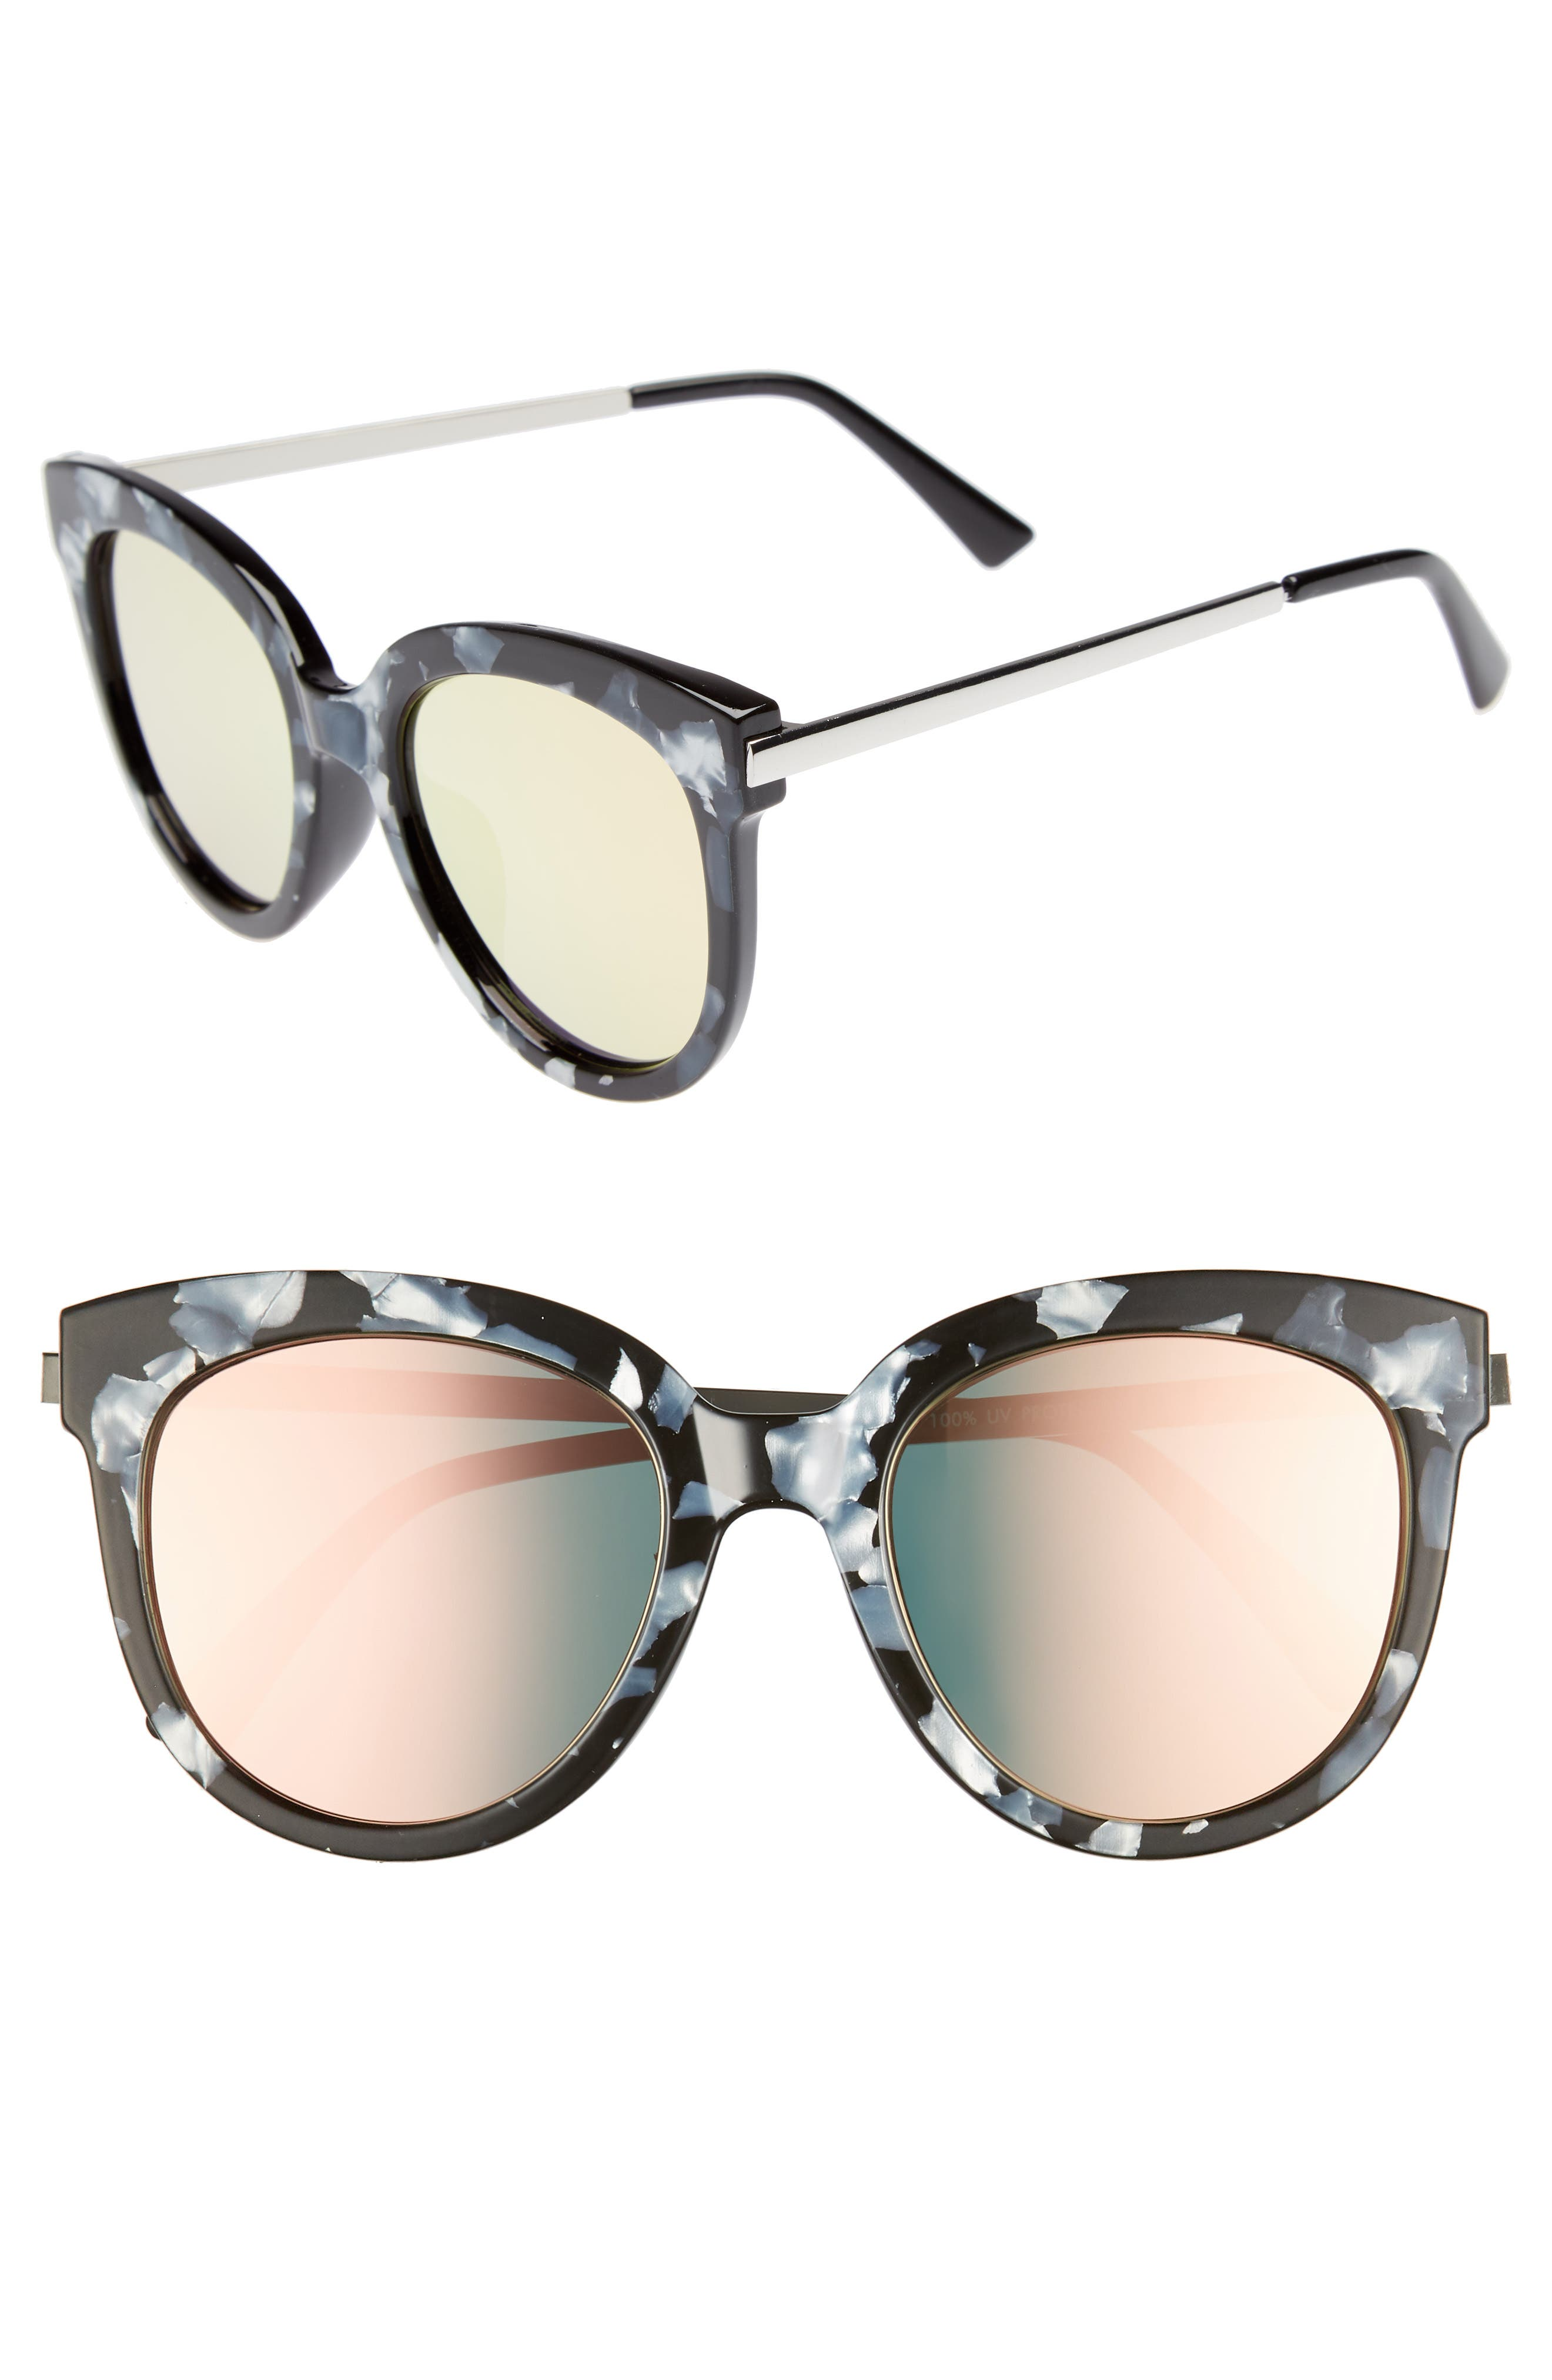 50mm Flat Cat Eye Sunglasses,                             Main thumbnail 1, color,                             Black Acide Pink